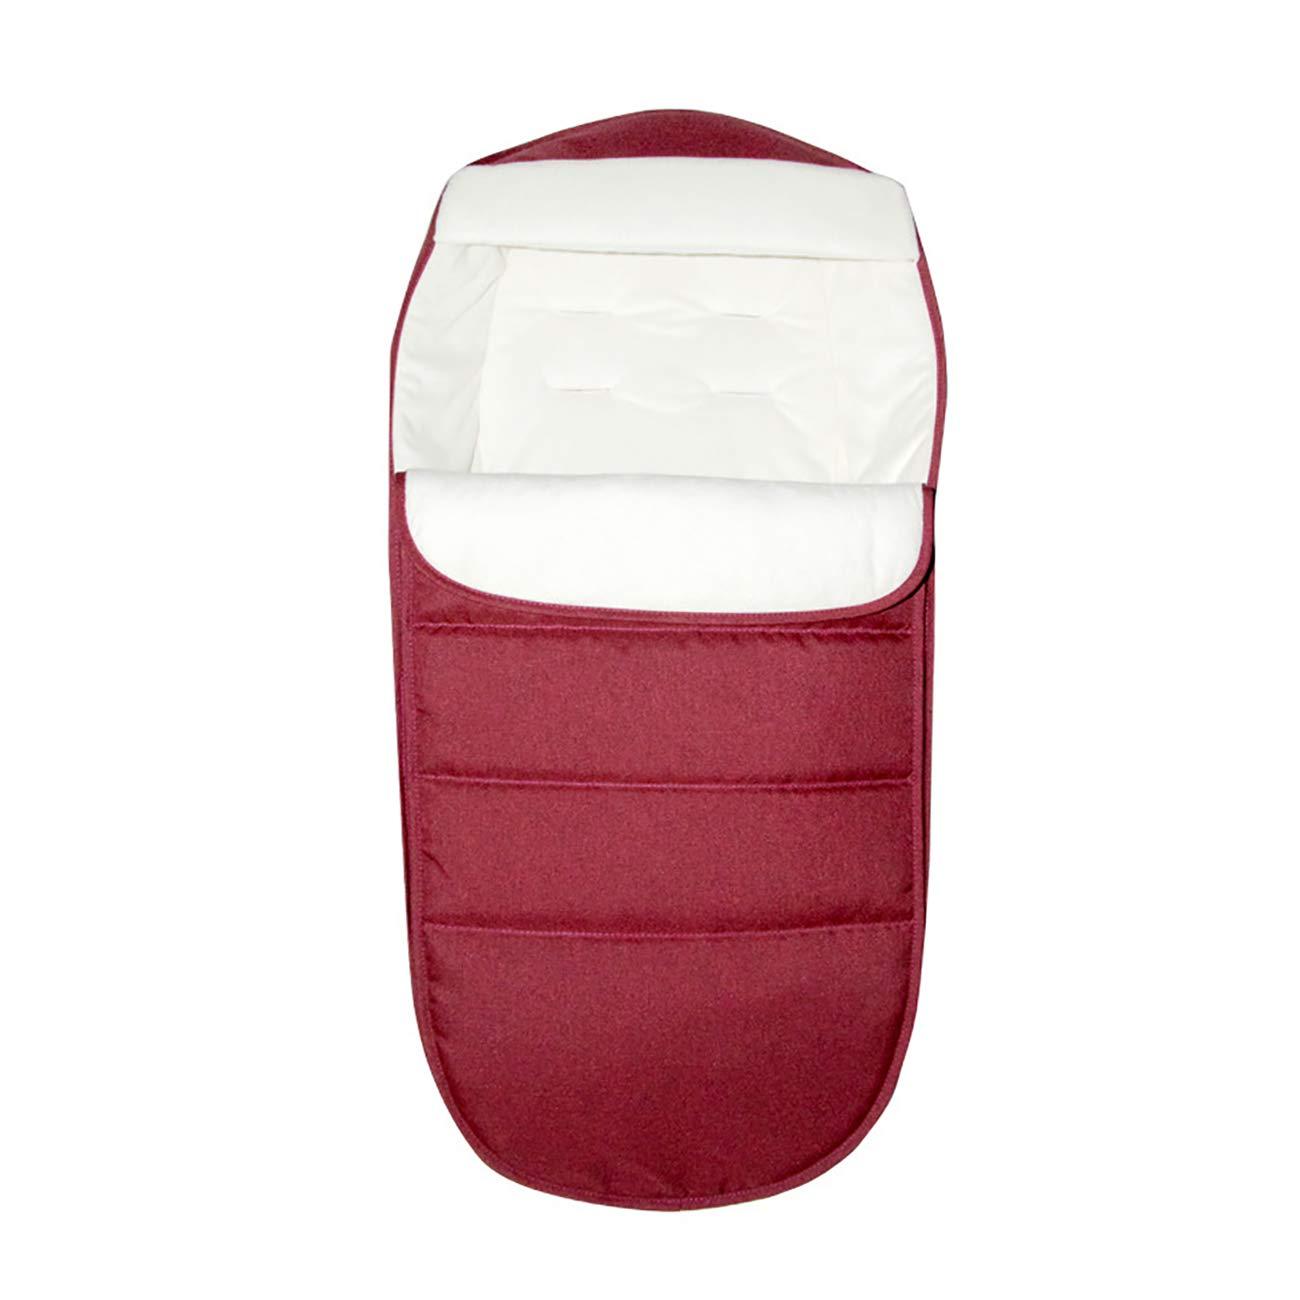 Boys Girls Stroller Swaddle Blanket Sleeping Bag Anti-Kicking Sleeping Nest Uheng Winter Outdoor Tour Newborn Baby Infant Stroller Sleeping Bag Warm Footmuff Sack Bunting Bag